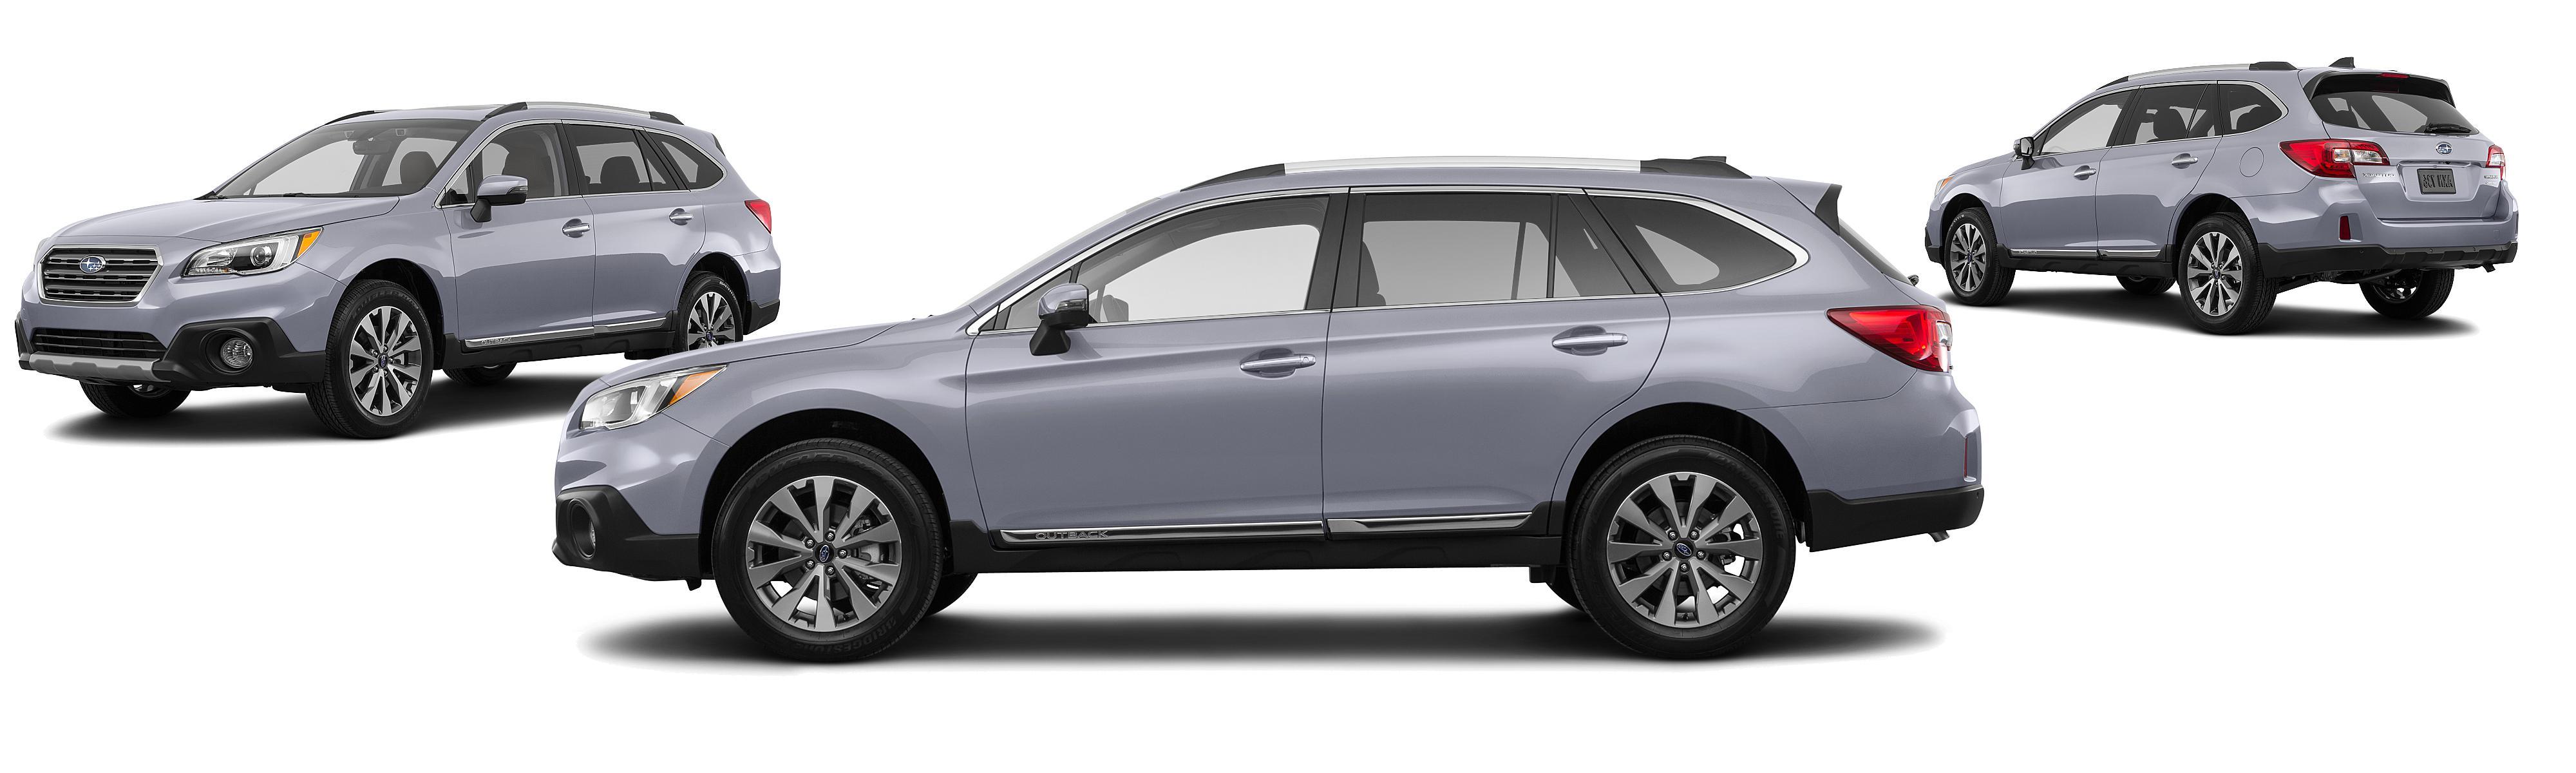 100 black subaru outback 2017 2015 subaru outback for Mercedes benz biome price in usa